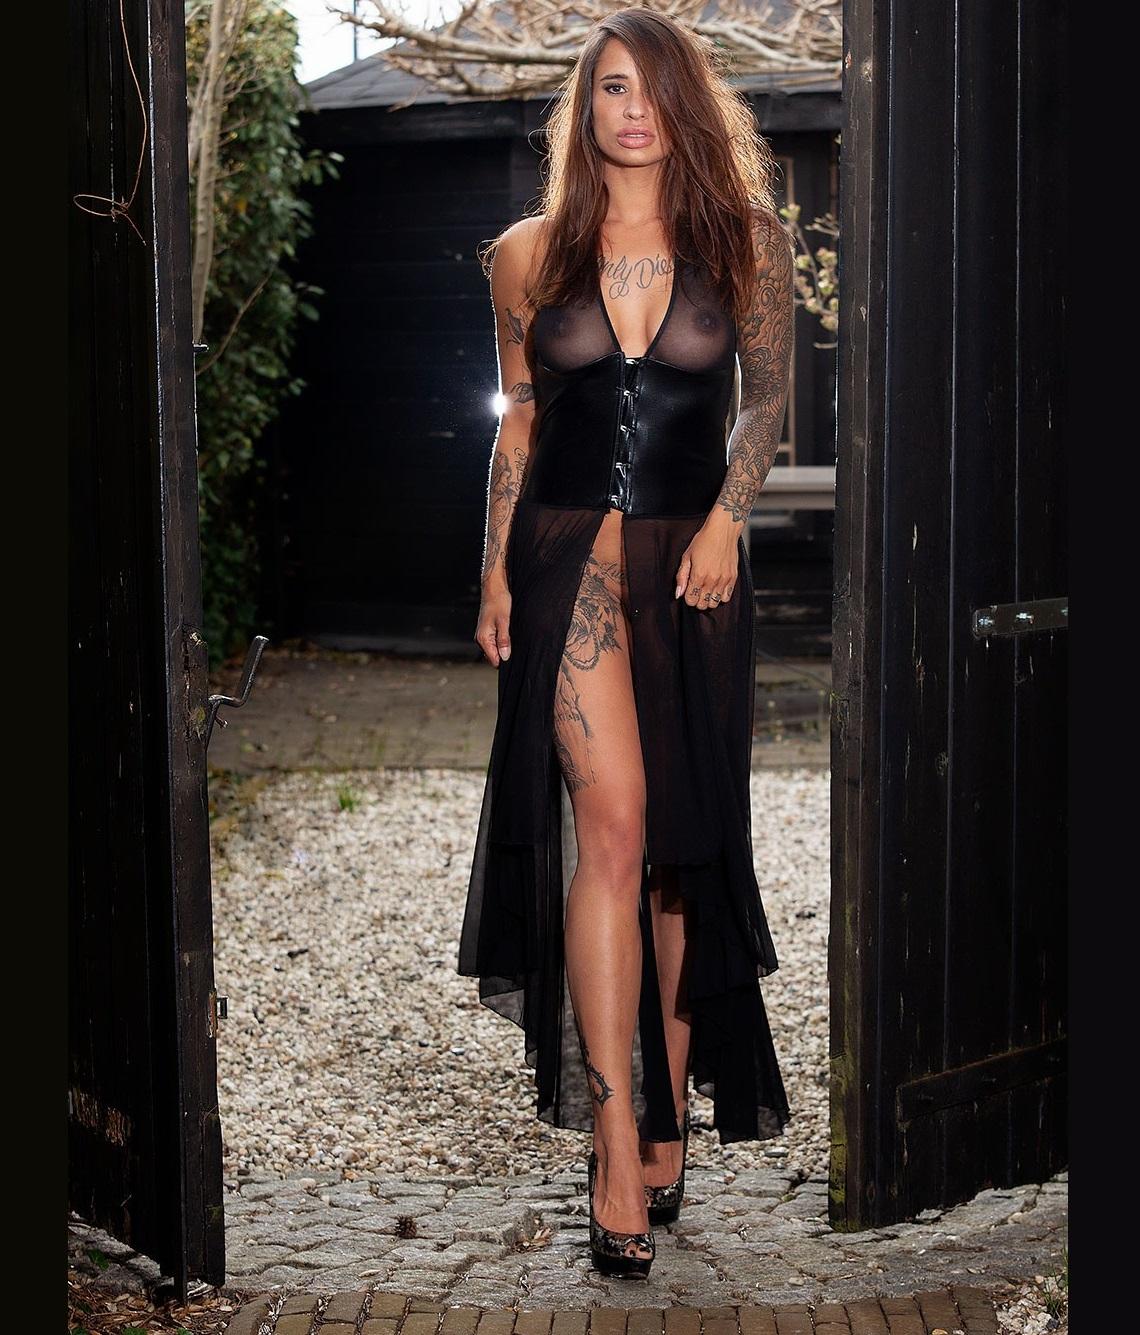 Femdominterview met de Amsterdamse Miss V.